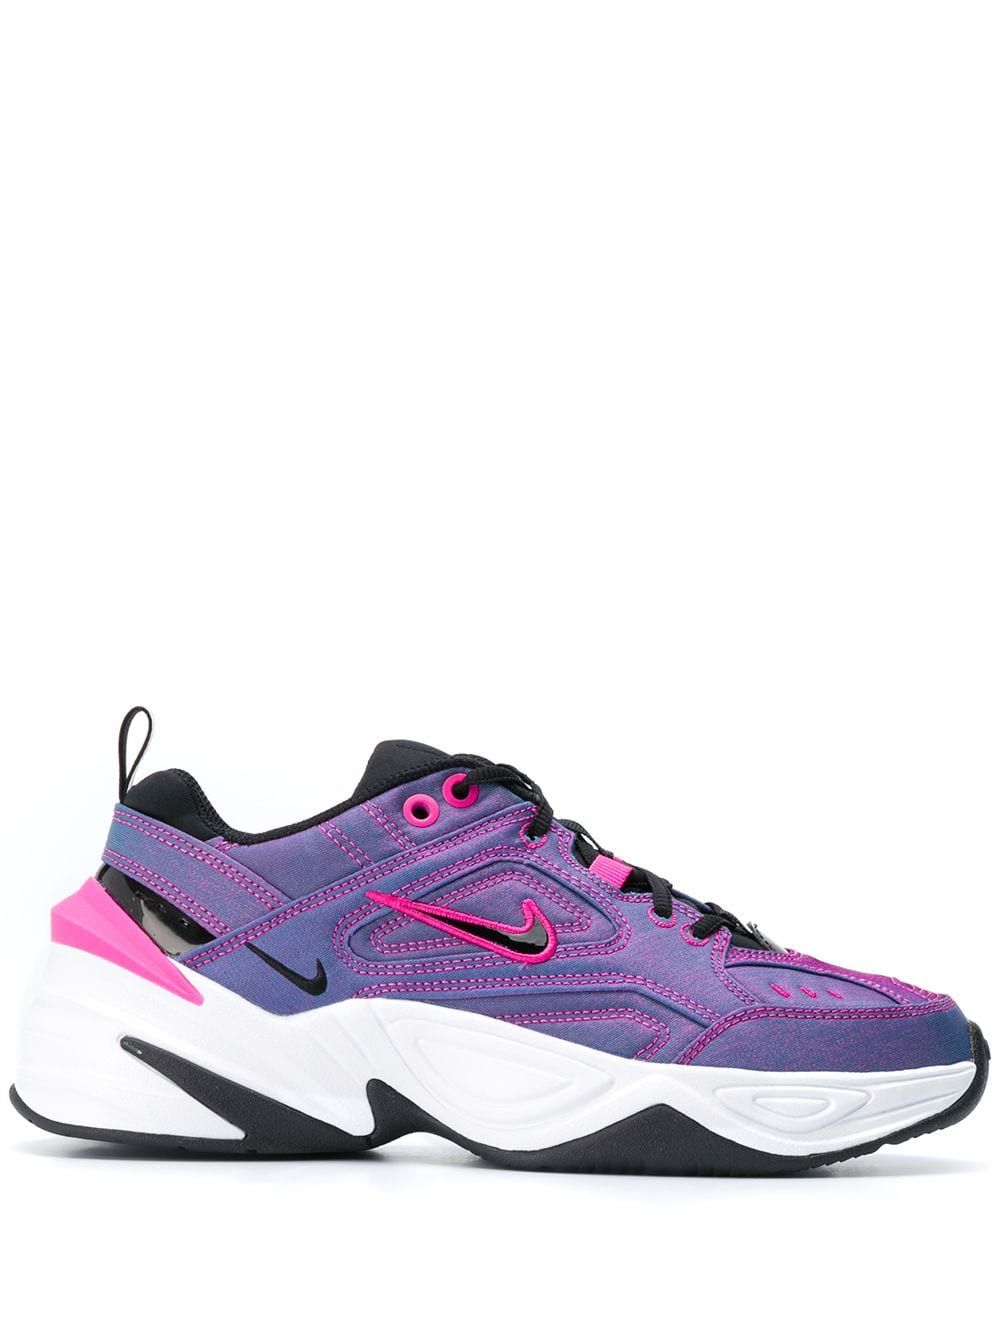 f3ddd929 Nike mk2 tekno sneakers - Pink | Products in 2019 | Sneakers nike ...